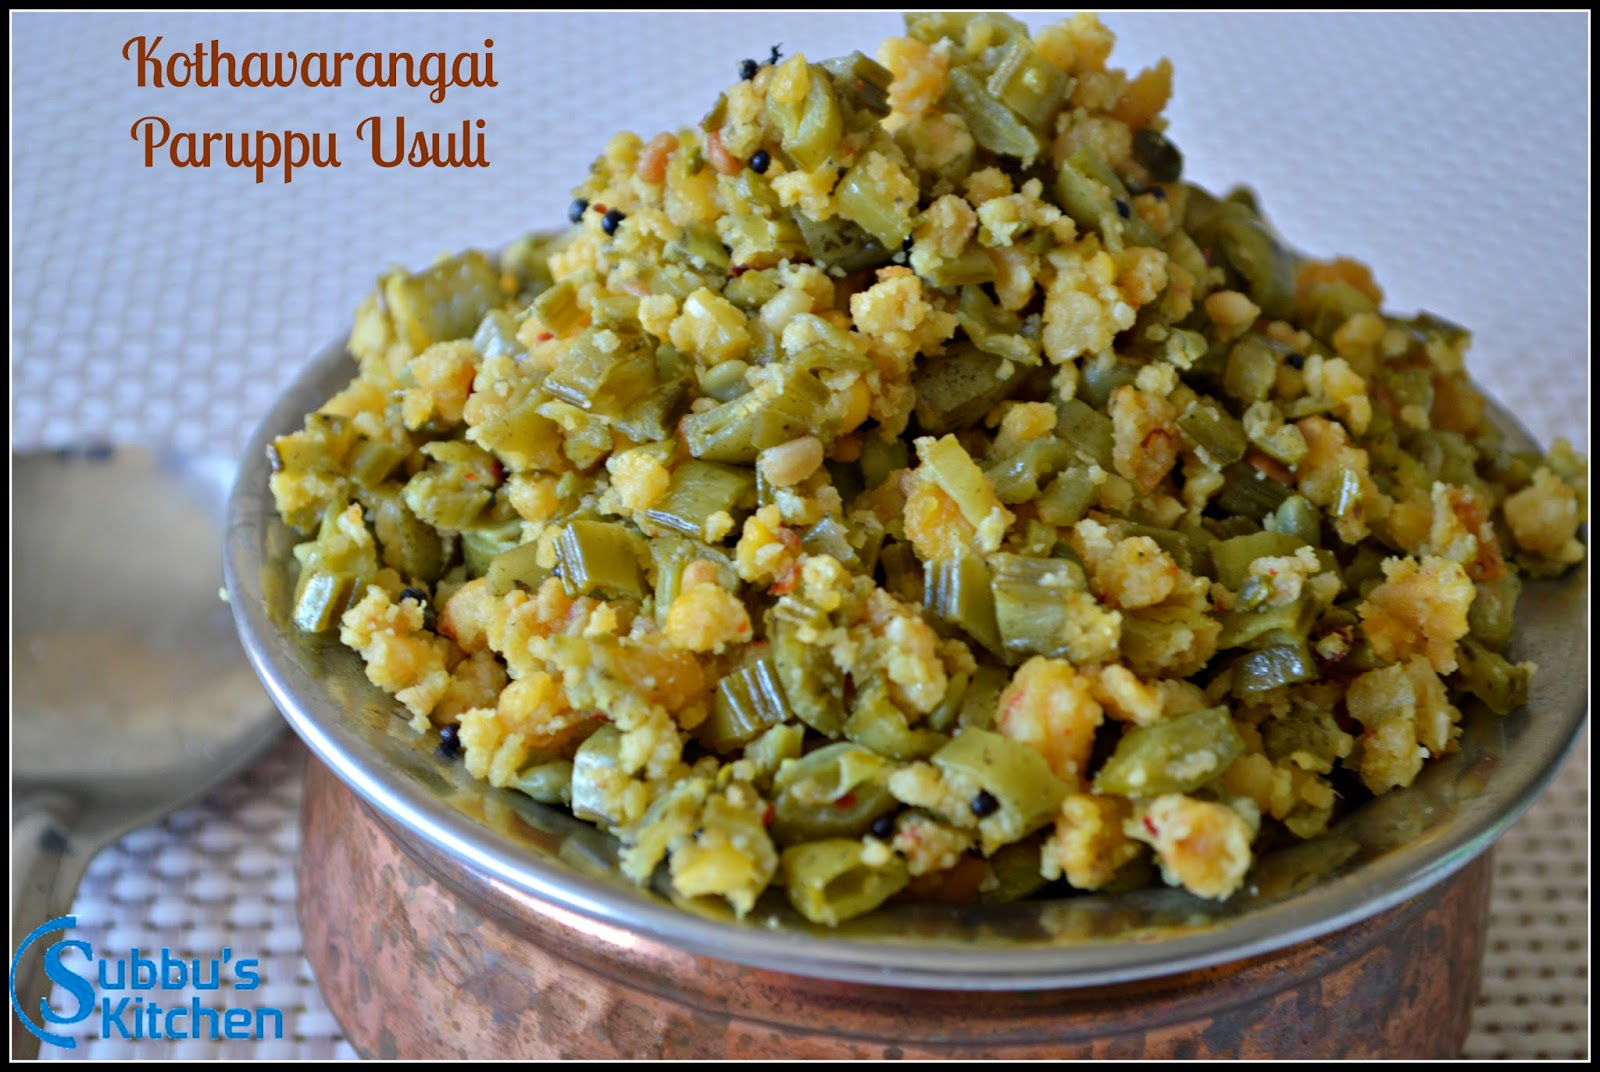 Clustered Beans Lentil Crumble / Kothavarangai Paruppu Usuli